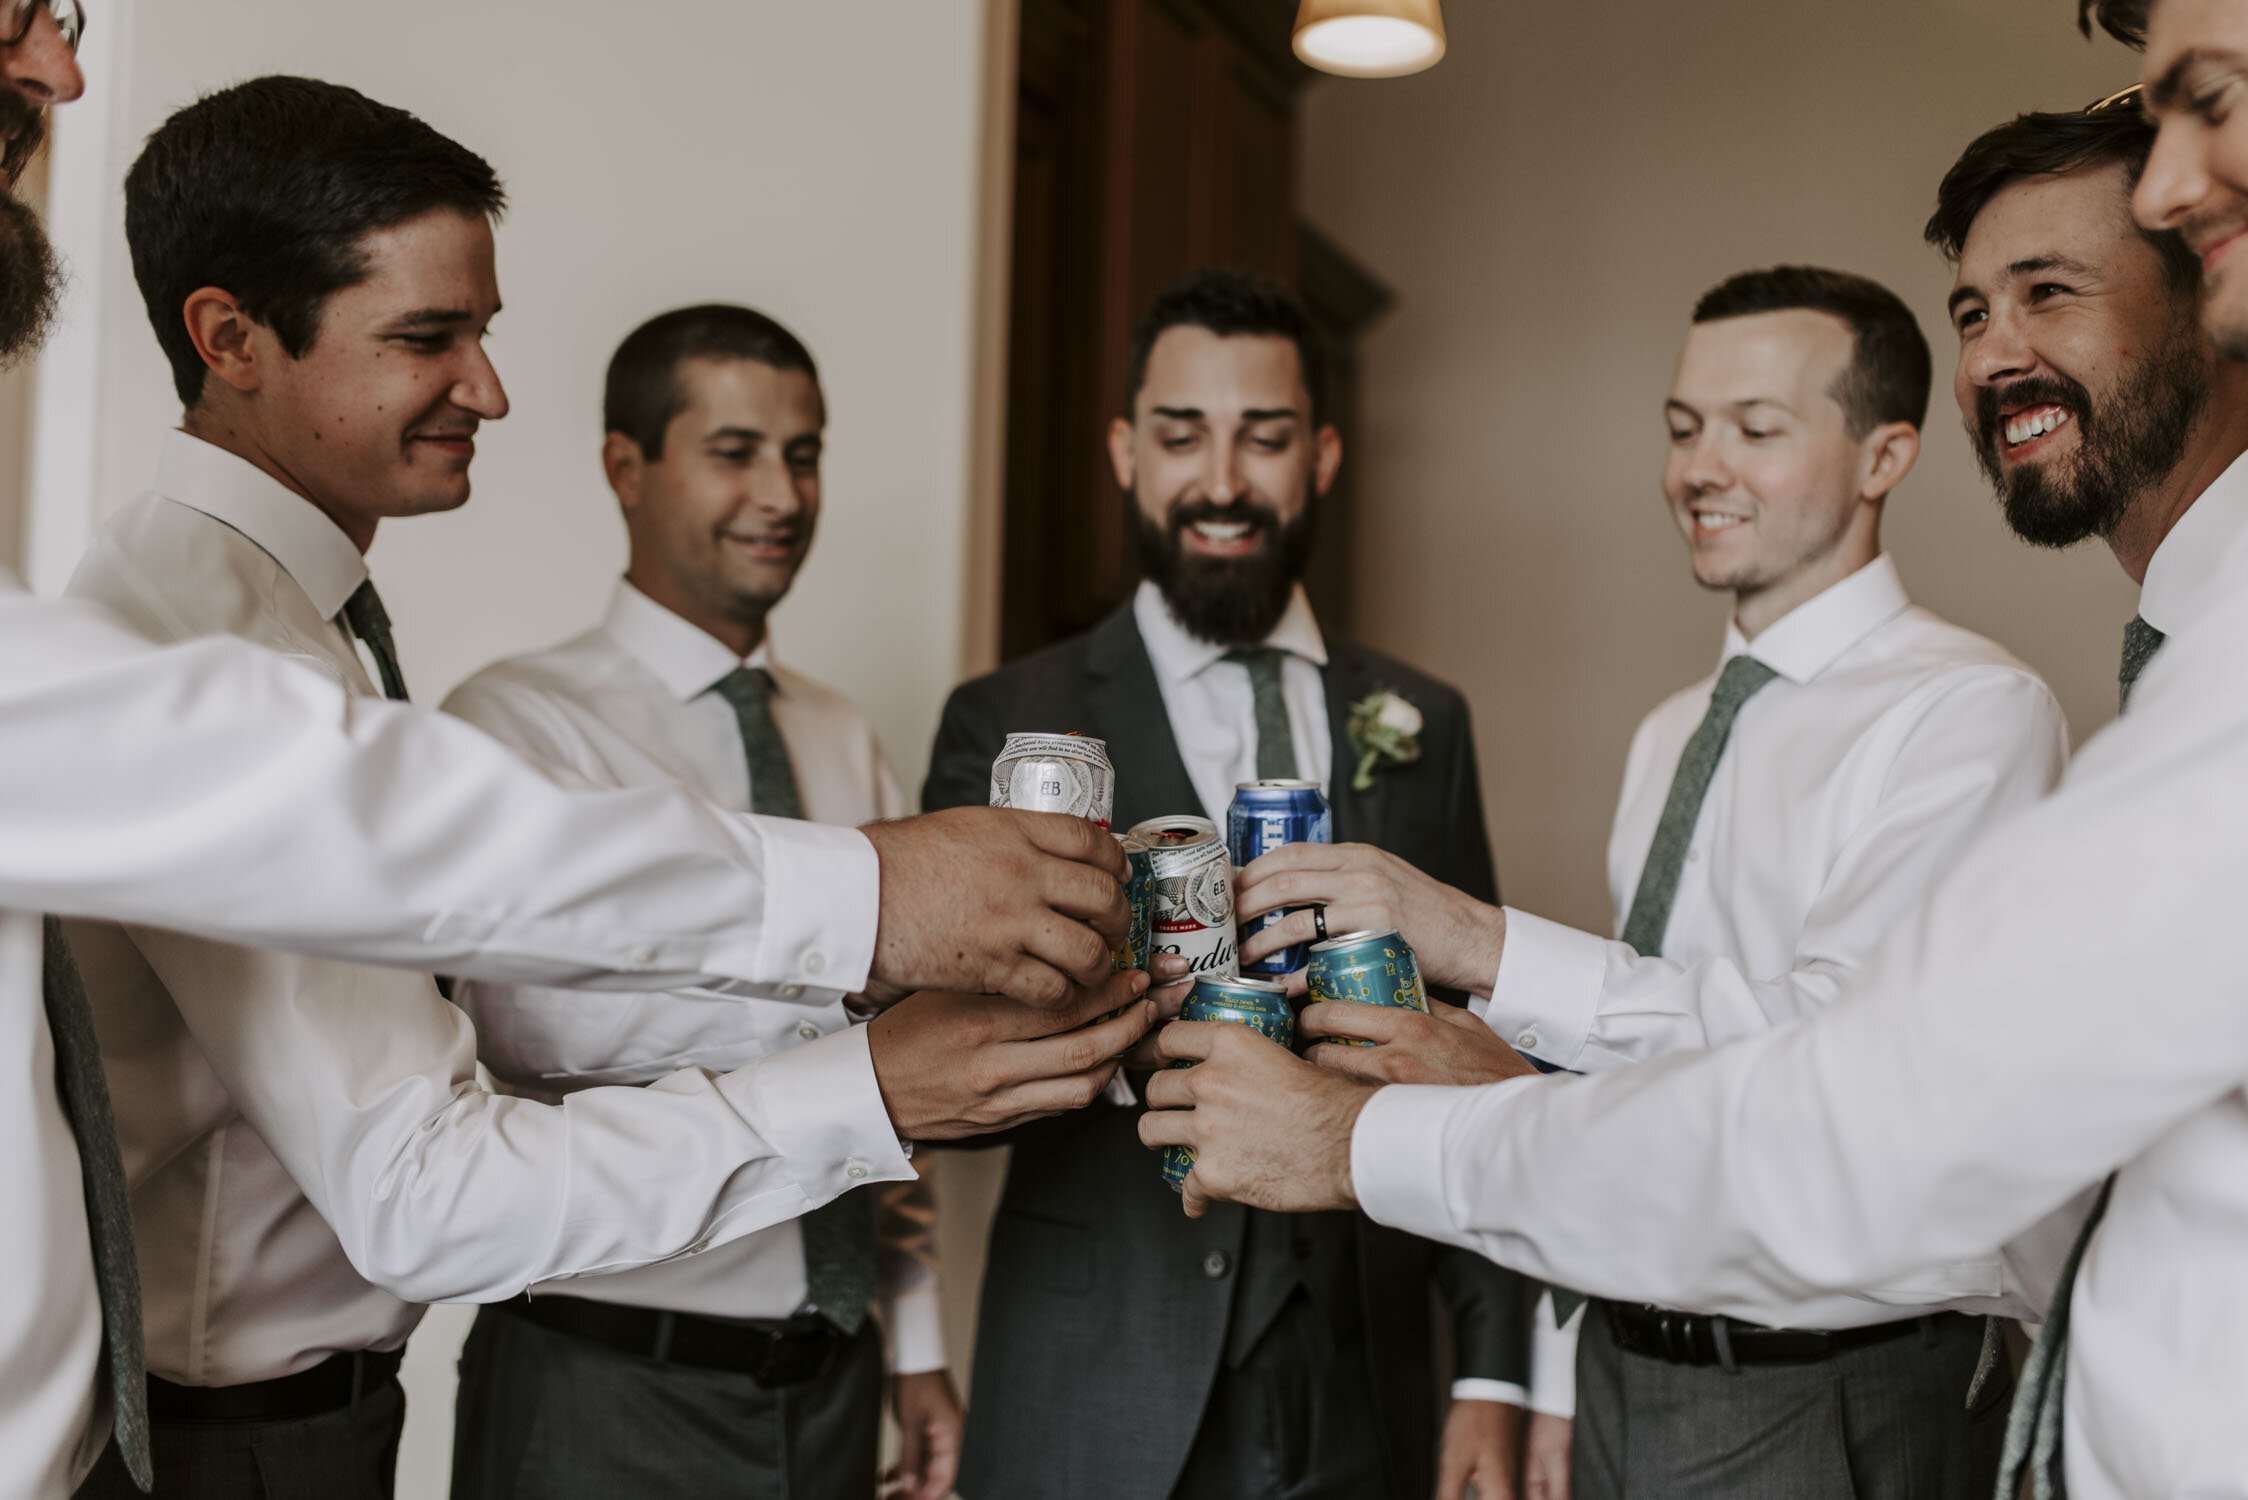 Groom and Groomsmen Getting Ready Photos at Bella Collina   By Greensboro, NC Wedding Photographer: Kayli LaFon Photography